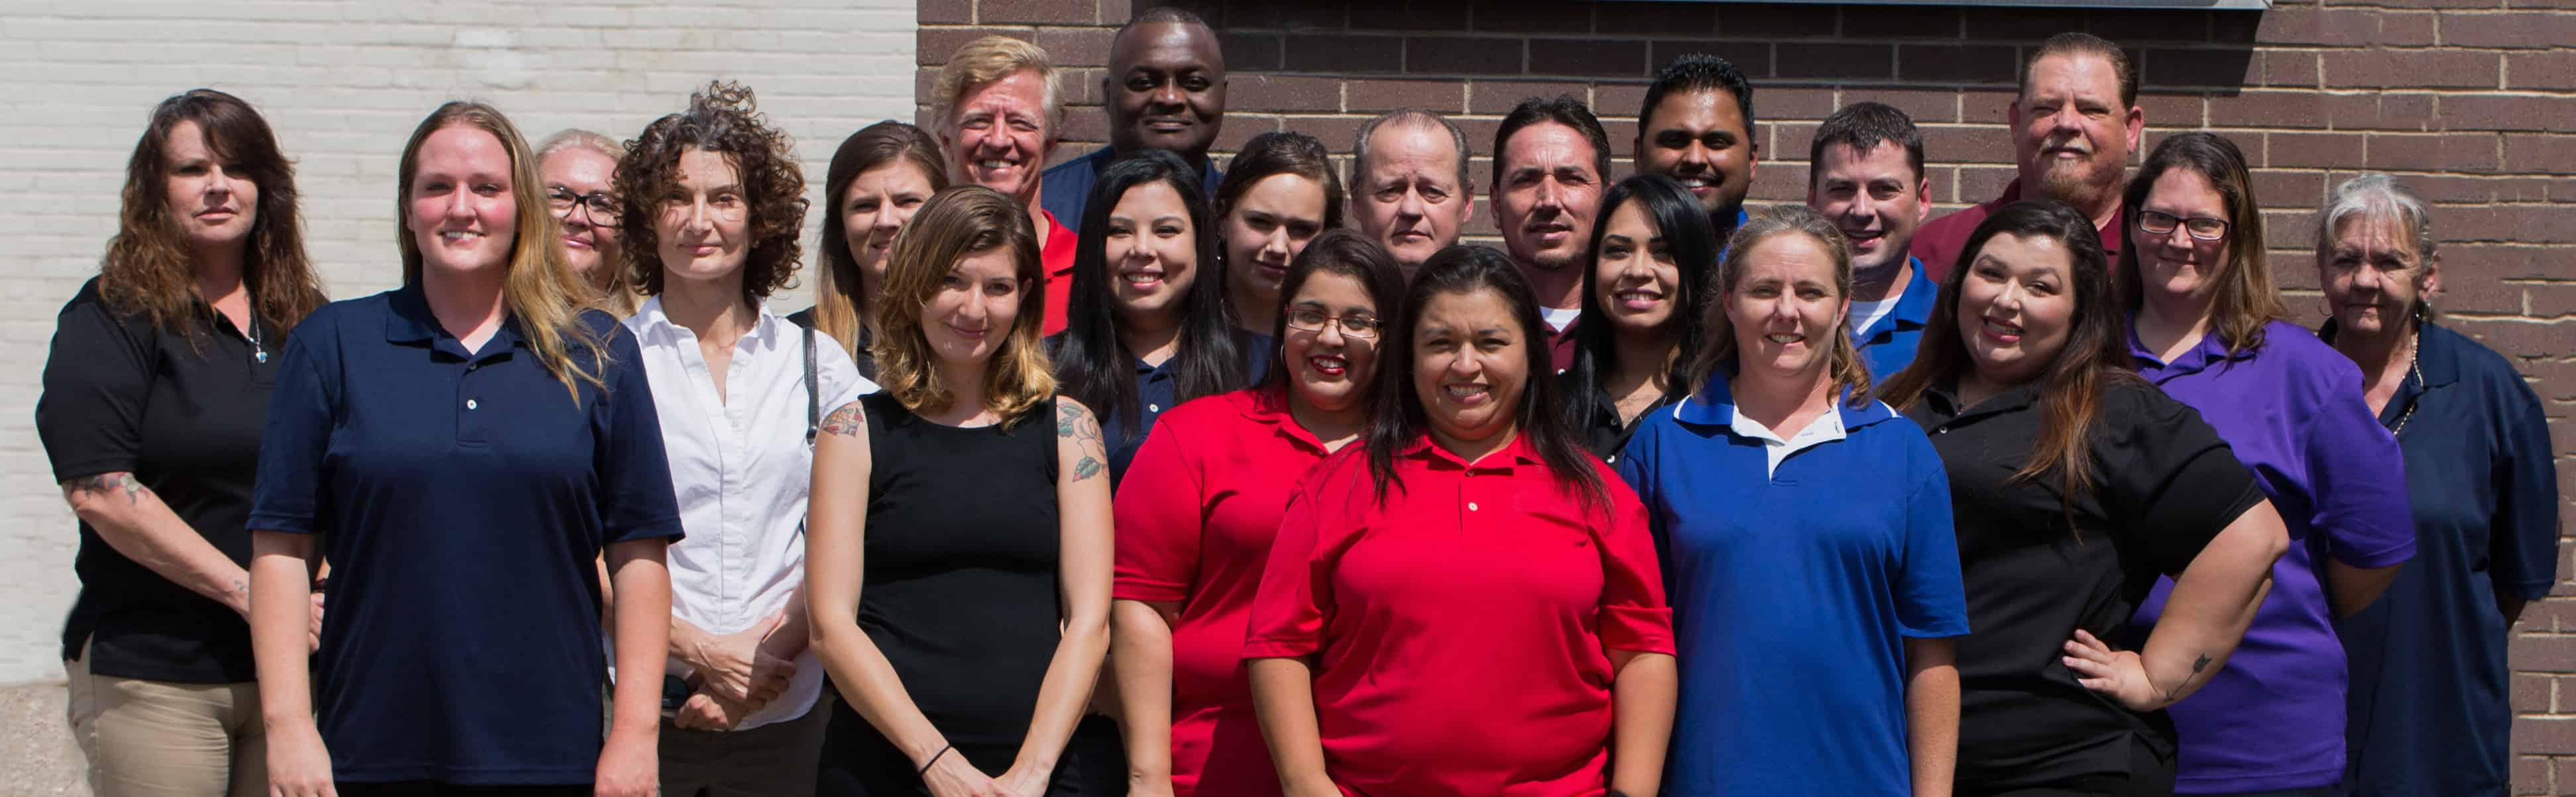 StrasGlobal Team